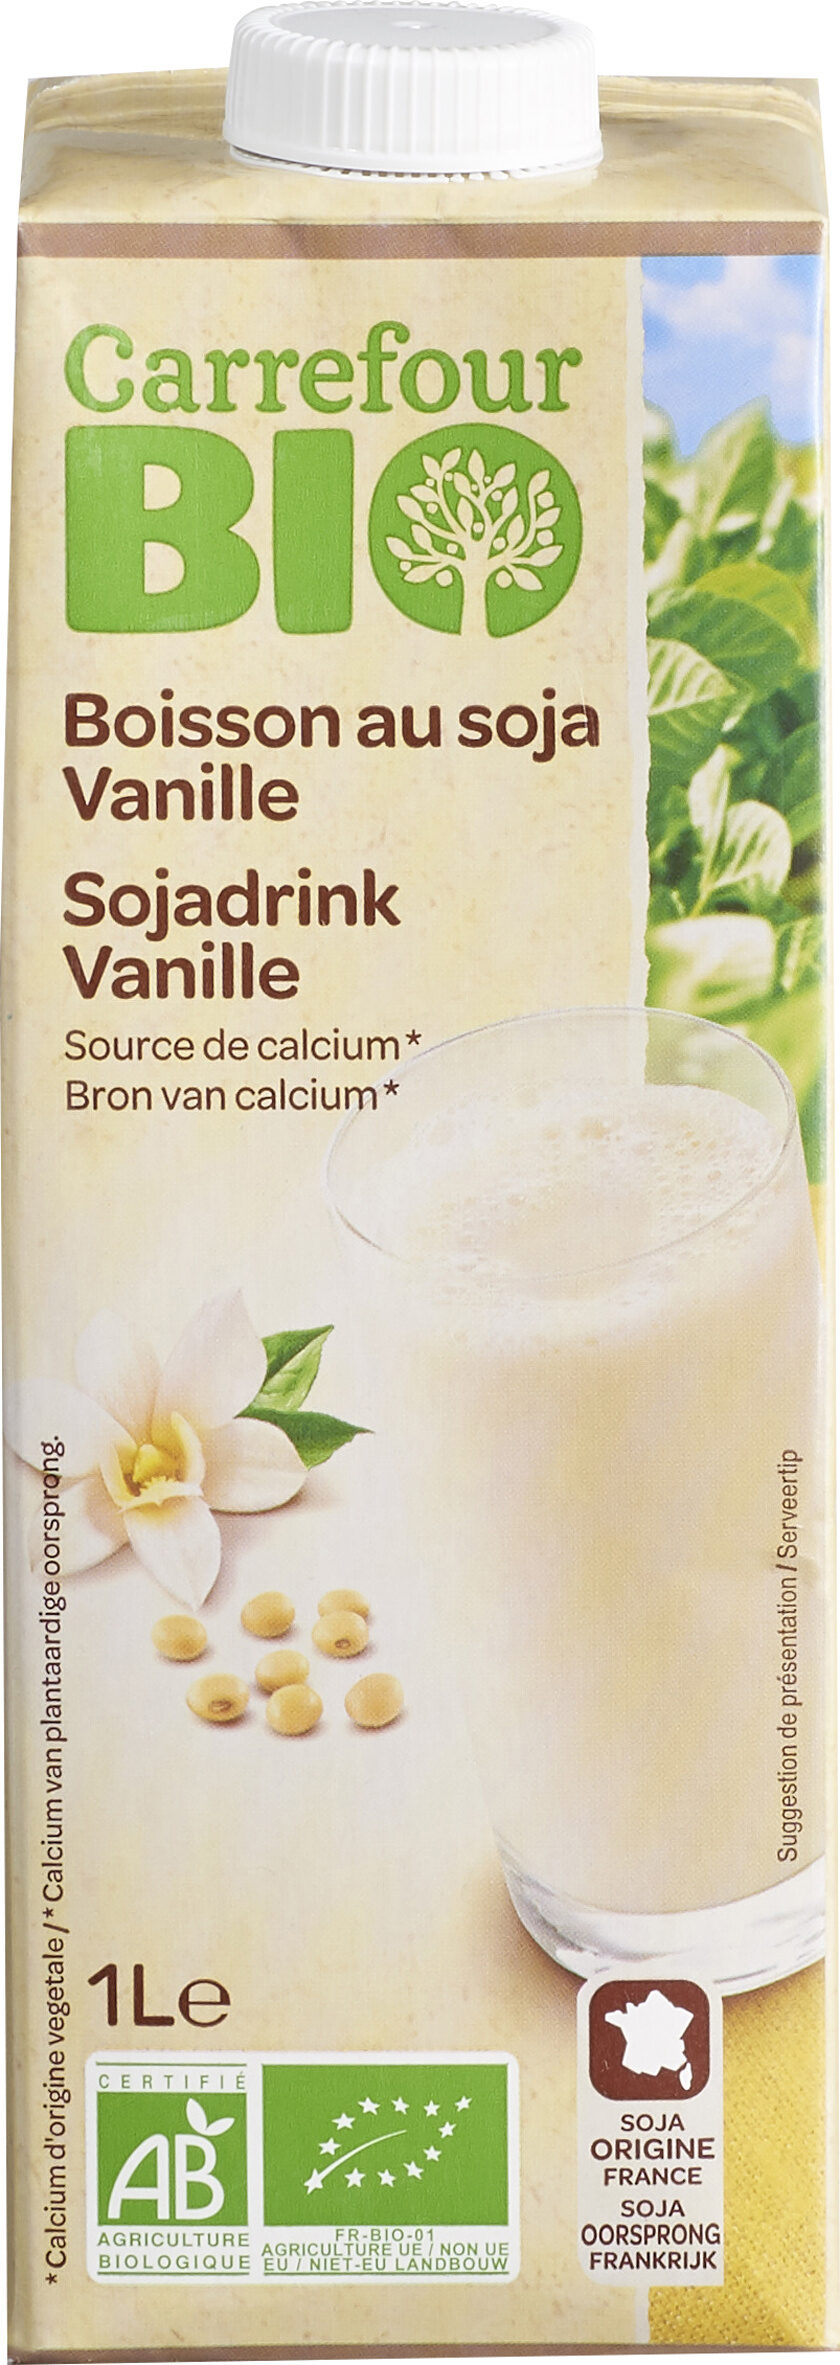 Boisson au soja vanille Source de calcium - Prodotto - fr